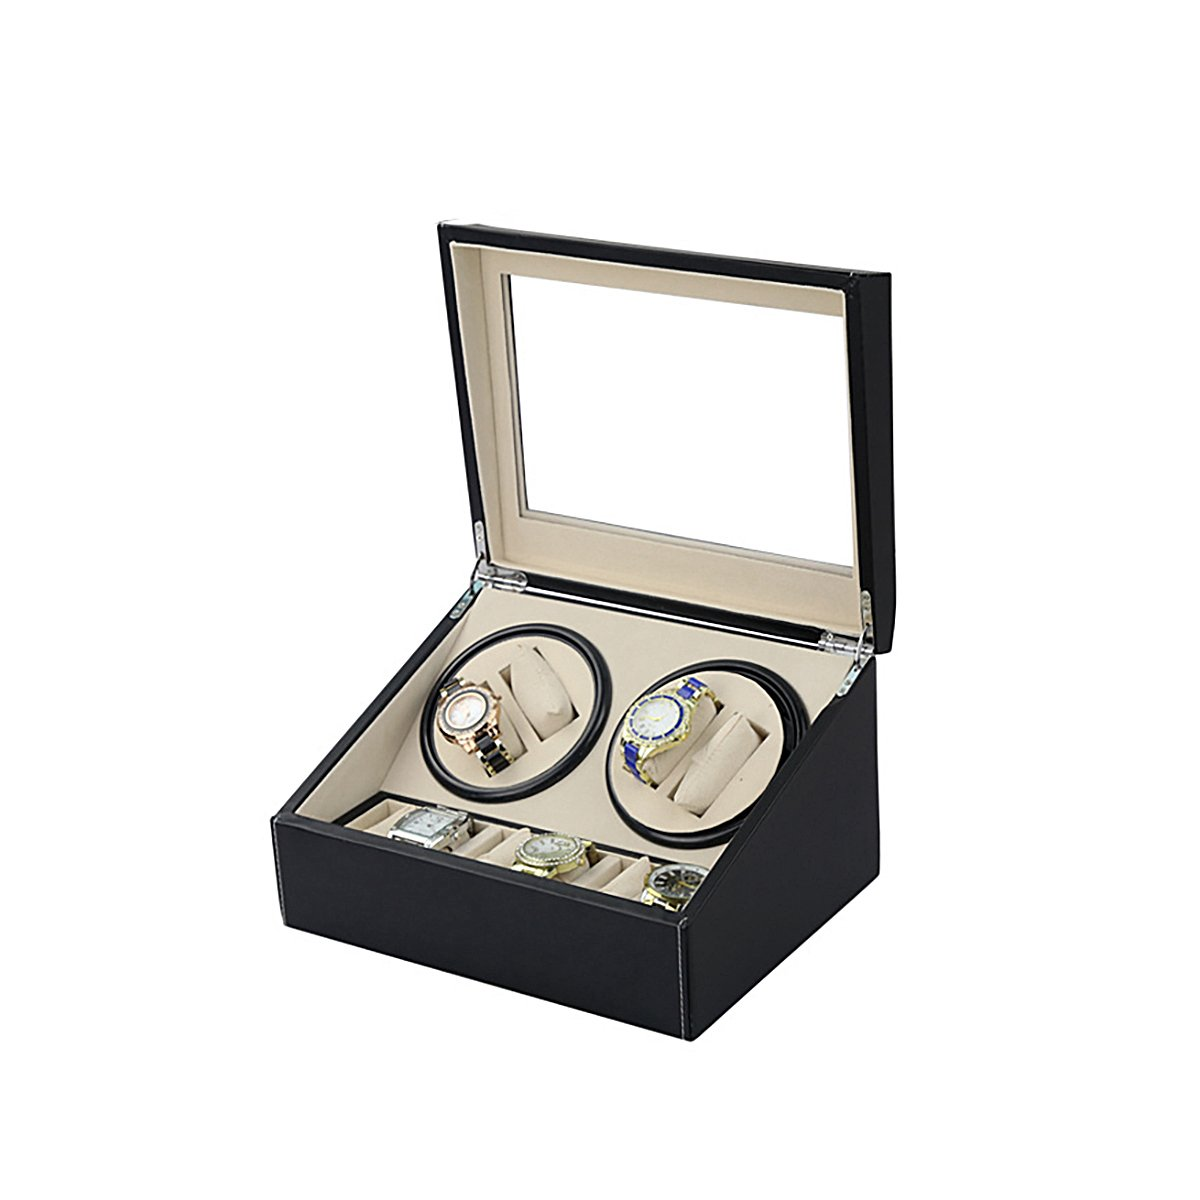 HooAMI Leather Automatic Rotation 4+6 Watch Winder Storage Case Display Box by HooAMI (Image #3)